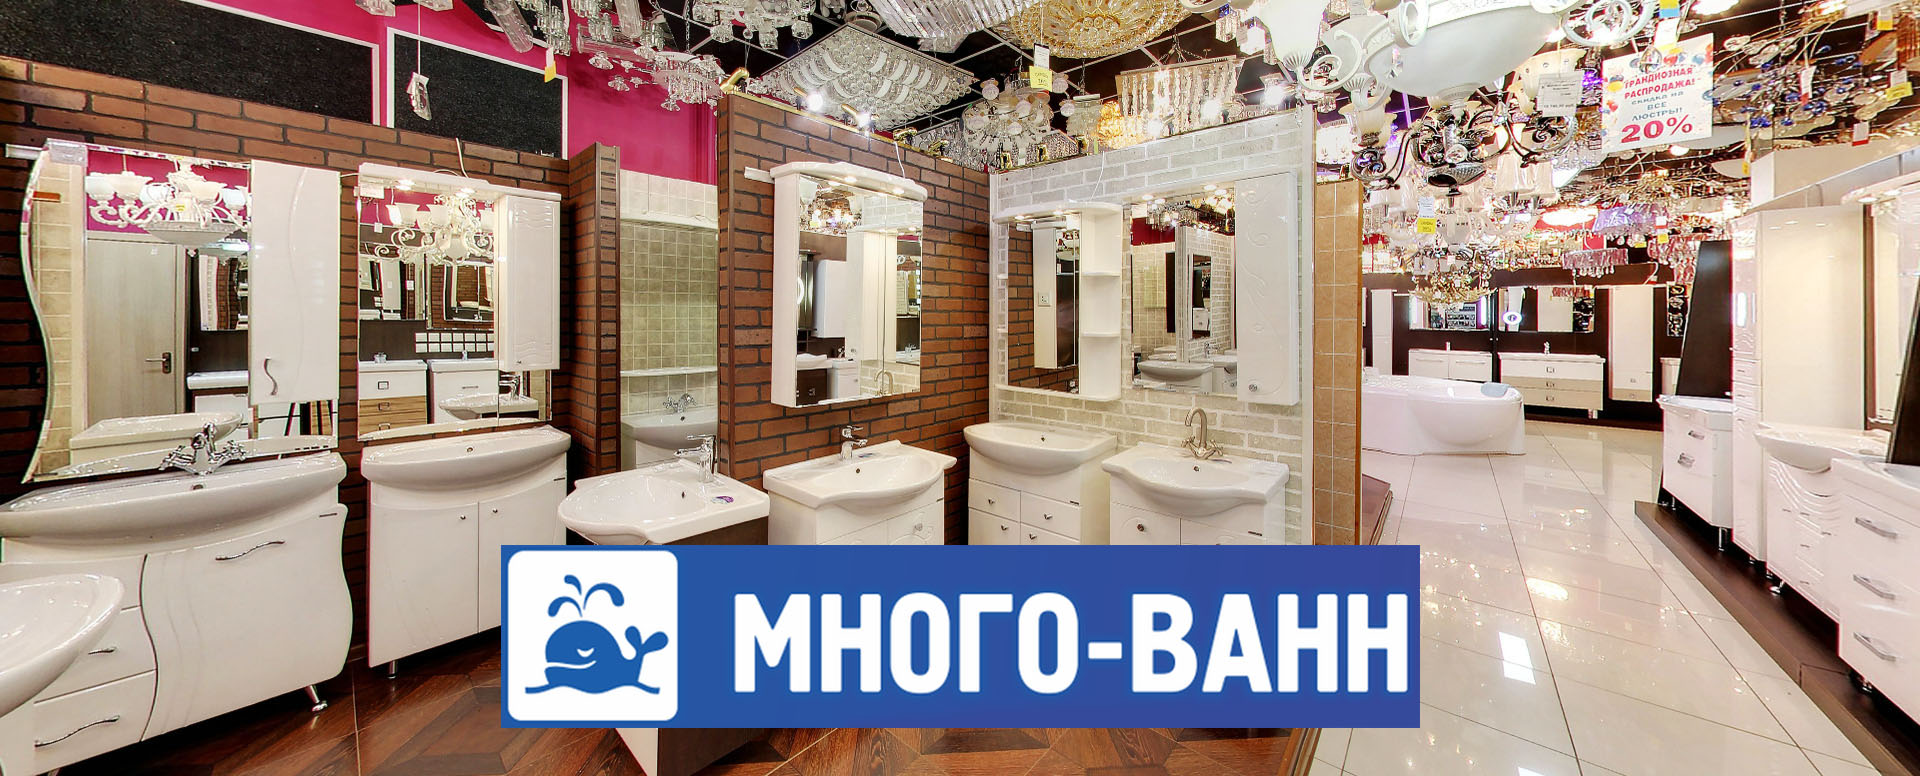 Много ванн, магазин сантехники